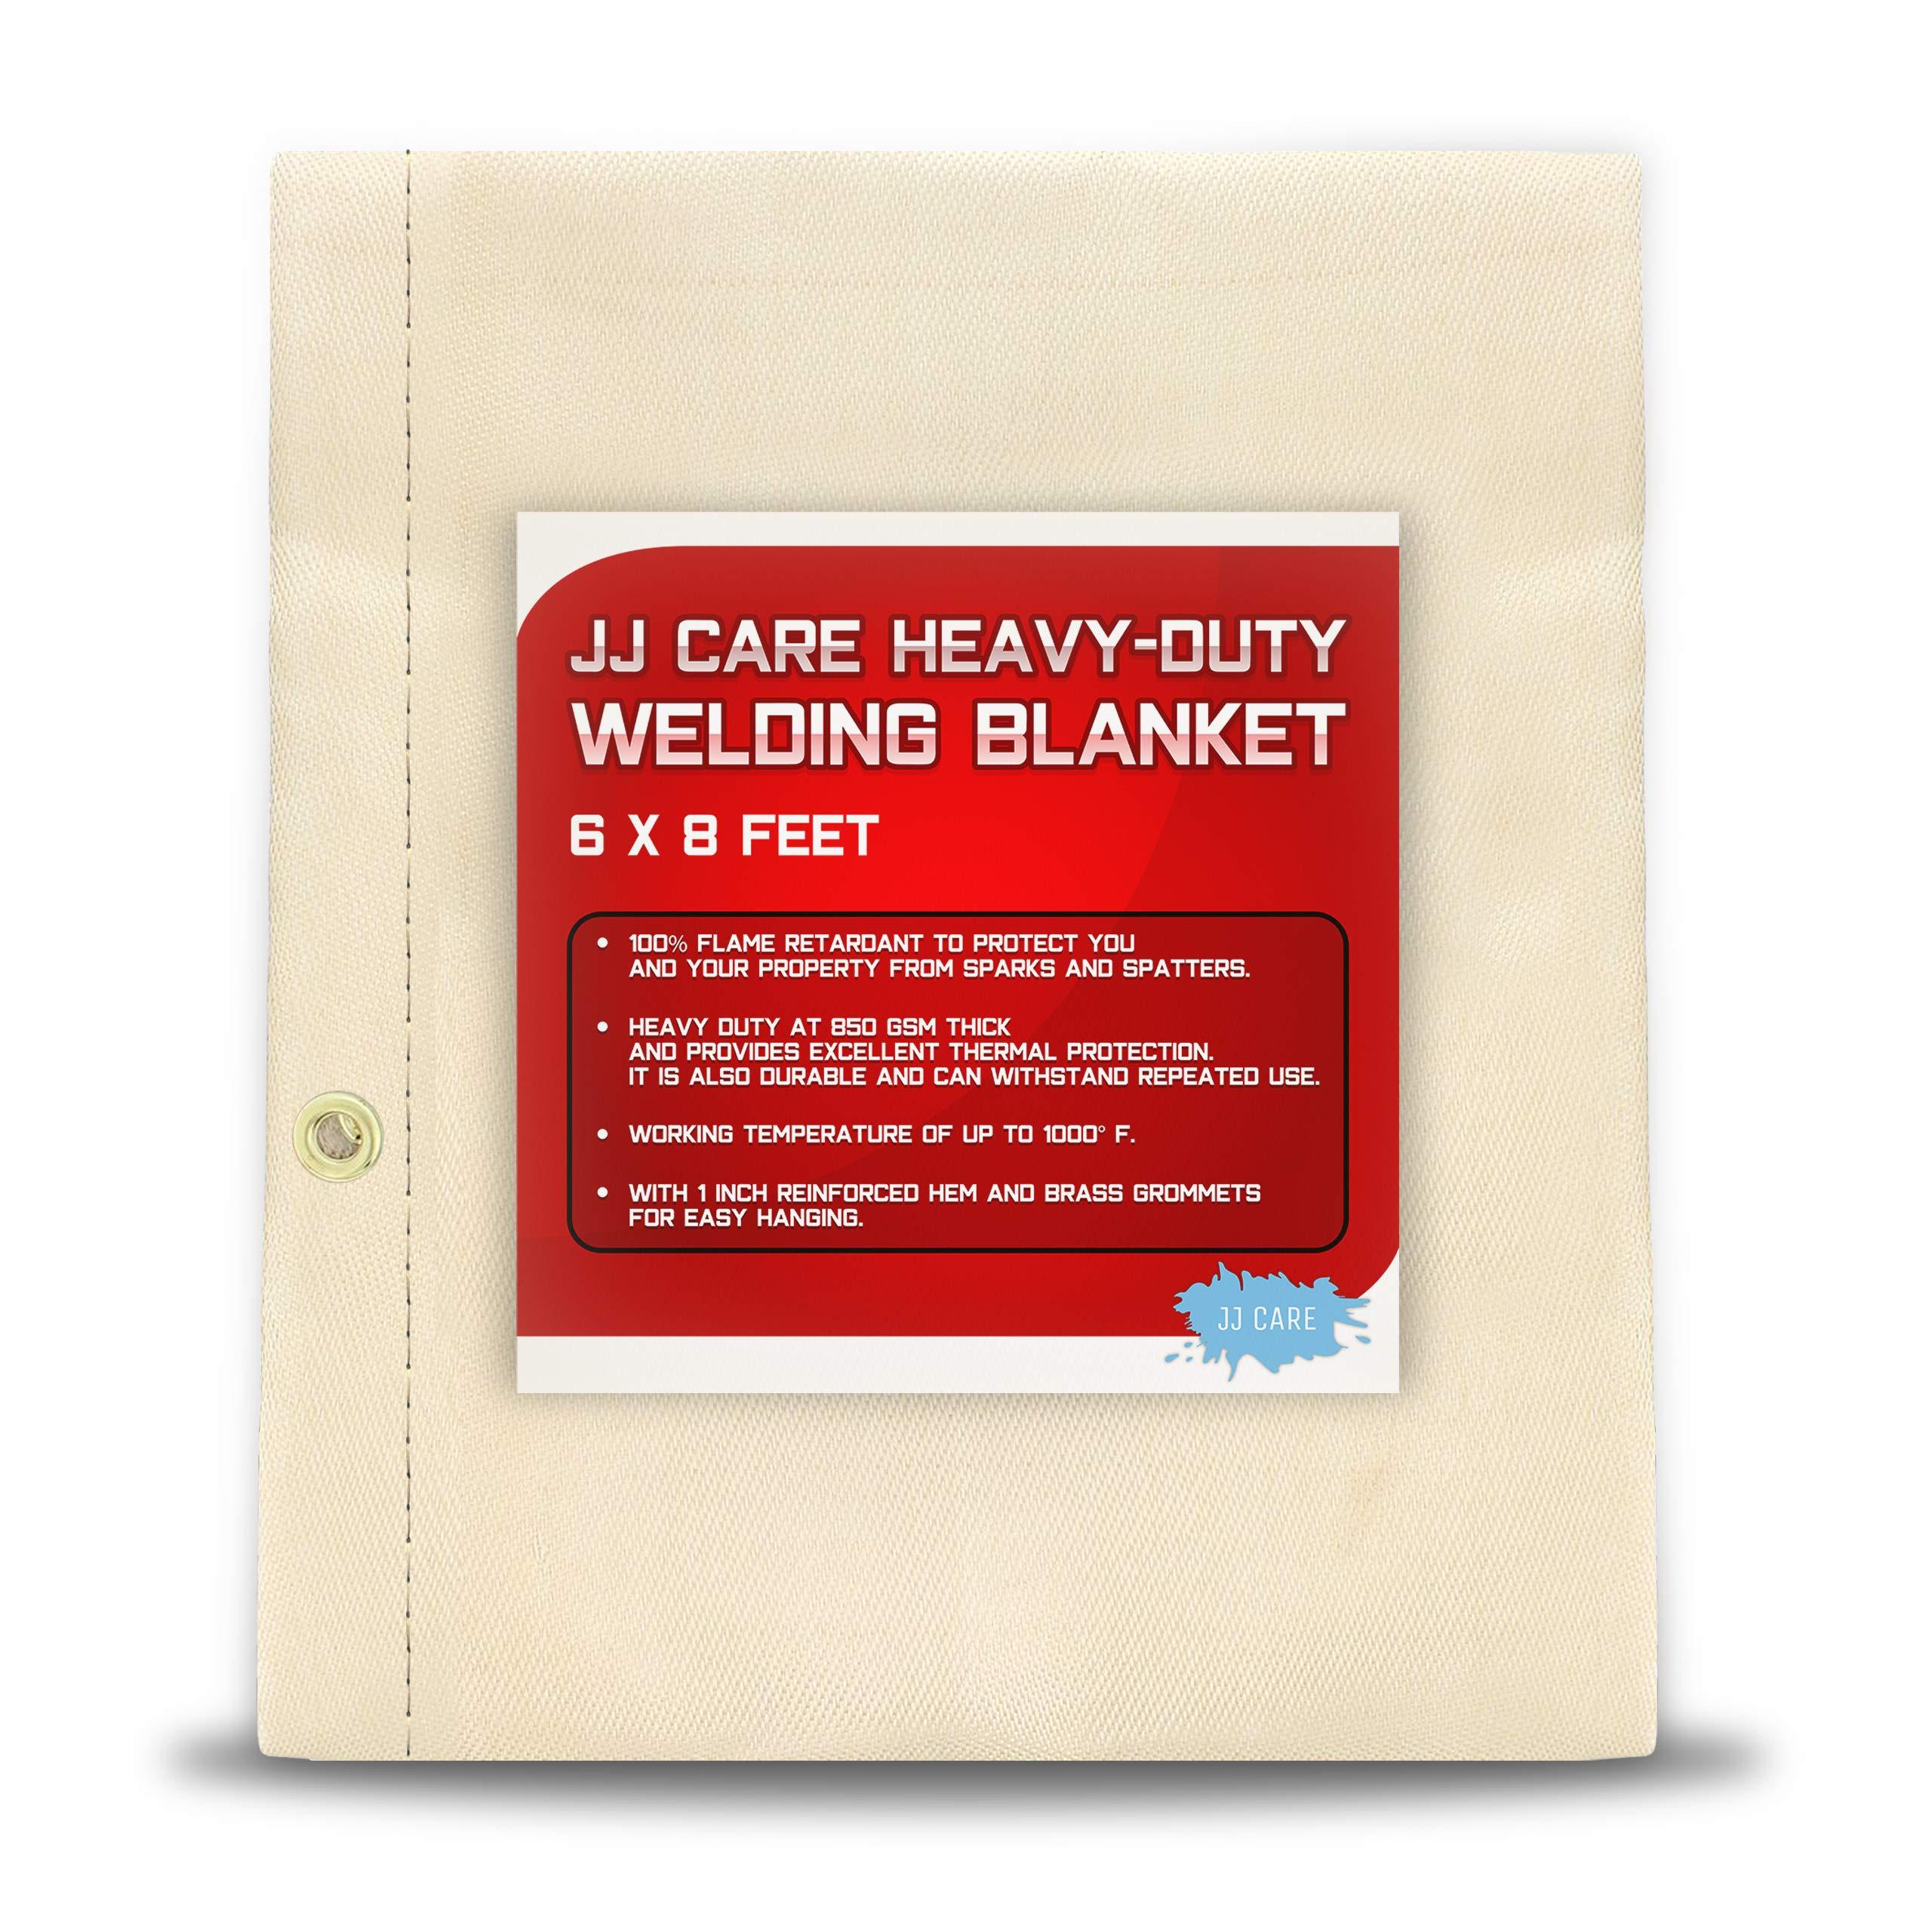 [PREMIUM] 6x8 ft Heavy Duty Welding Blanket [850GSM Thick] Fiberglass, Fire Retardant Welding Curtain, Weld Blanket, Welding Shield, Fire Blanket - JJ CARE by JJ CARE